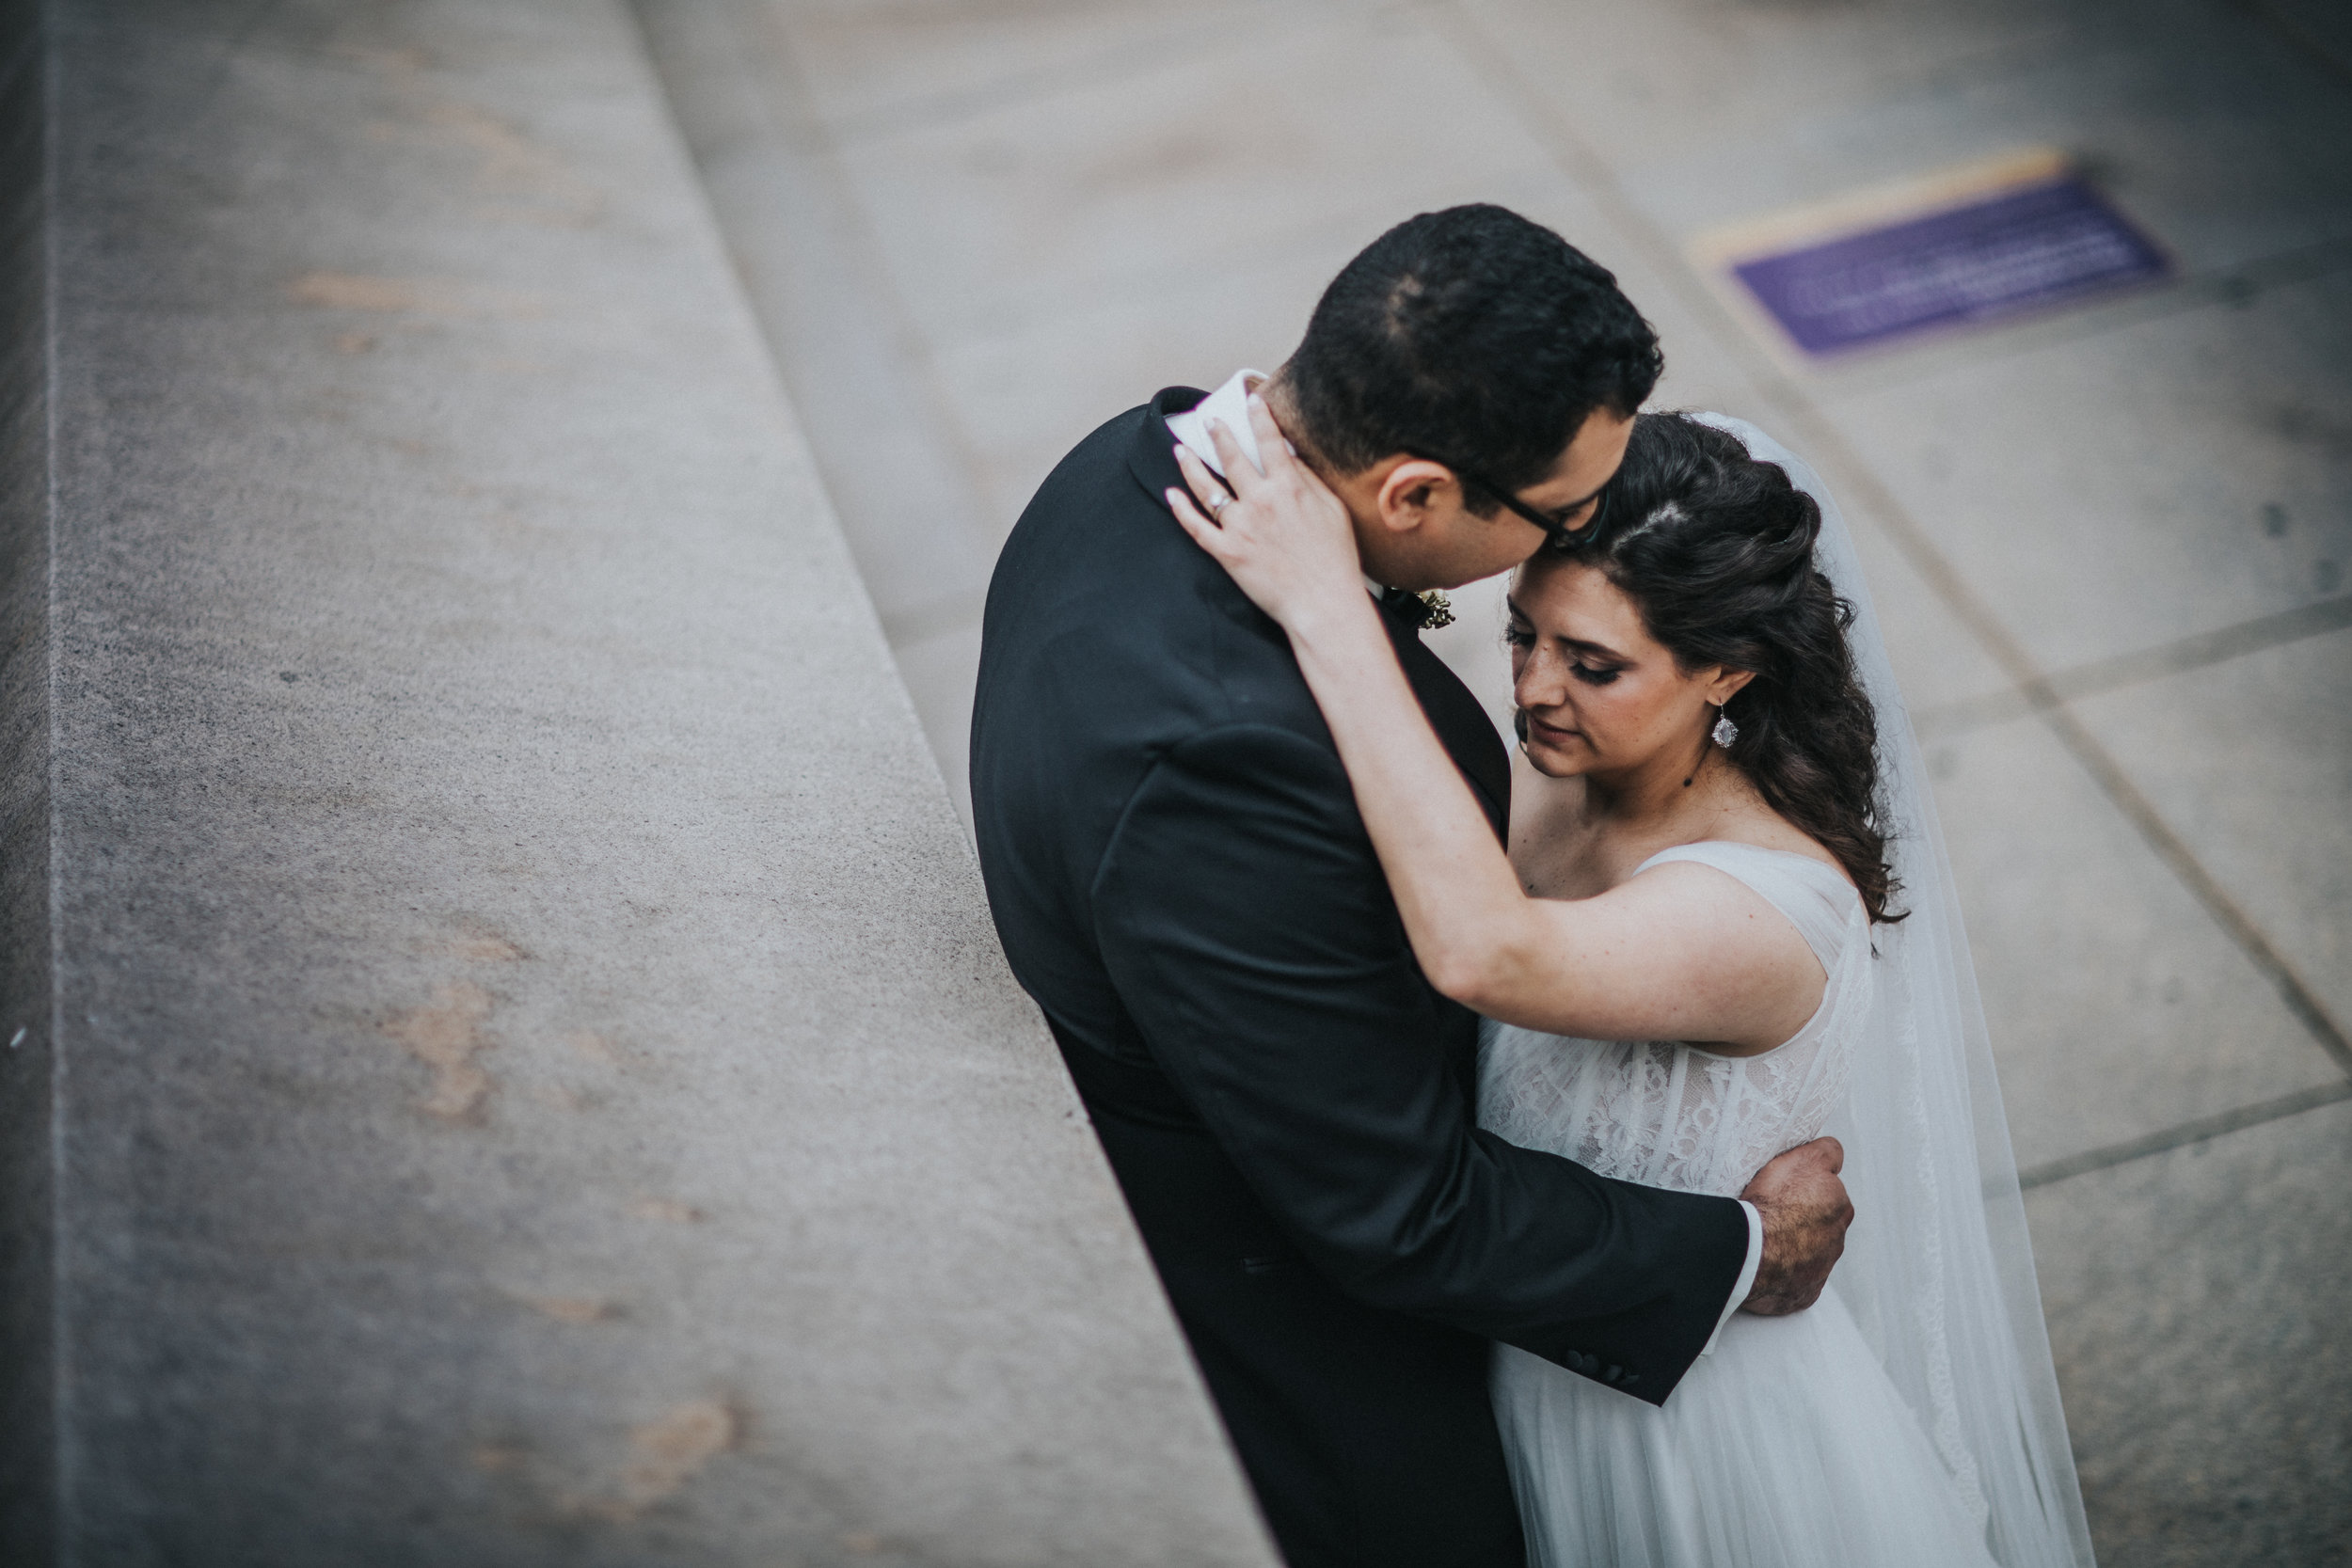 JennaLynnPhotography-NJWeddingPhotographer-Philadelphia-Wedding-ArtsBallroom-BridalParty-80.jpg